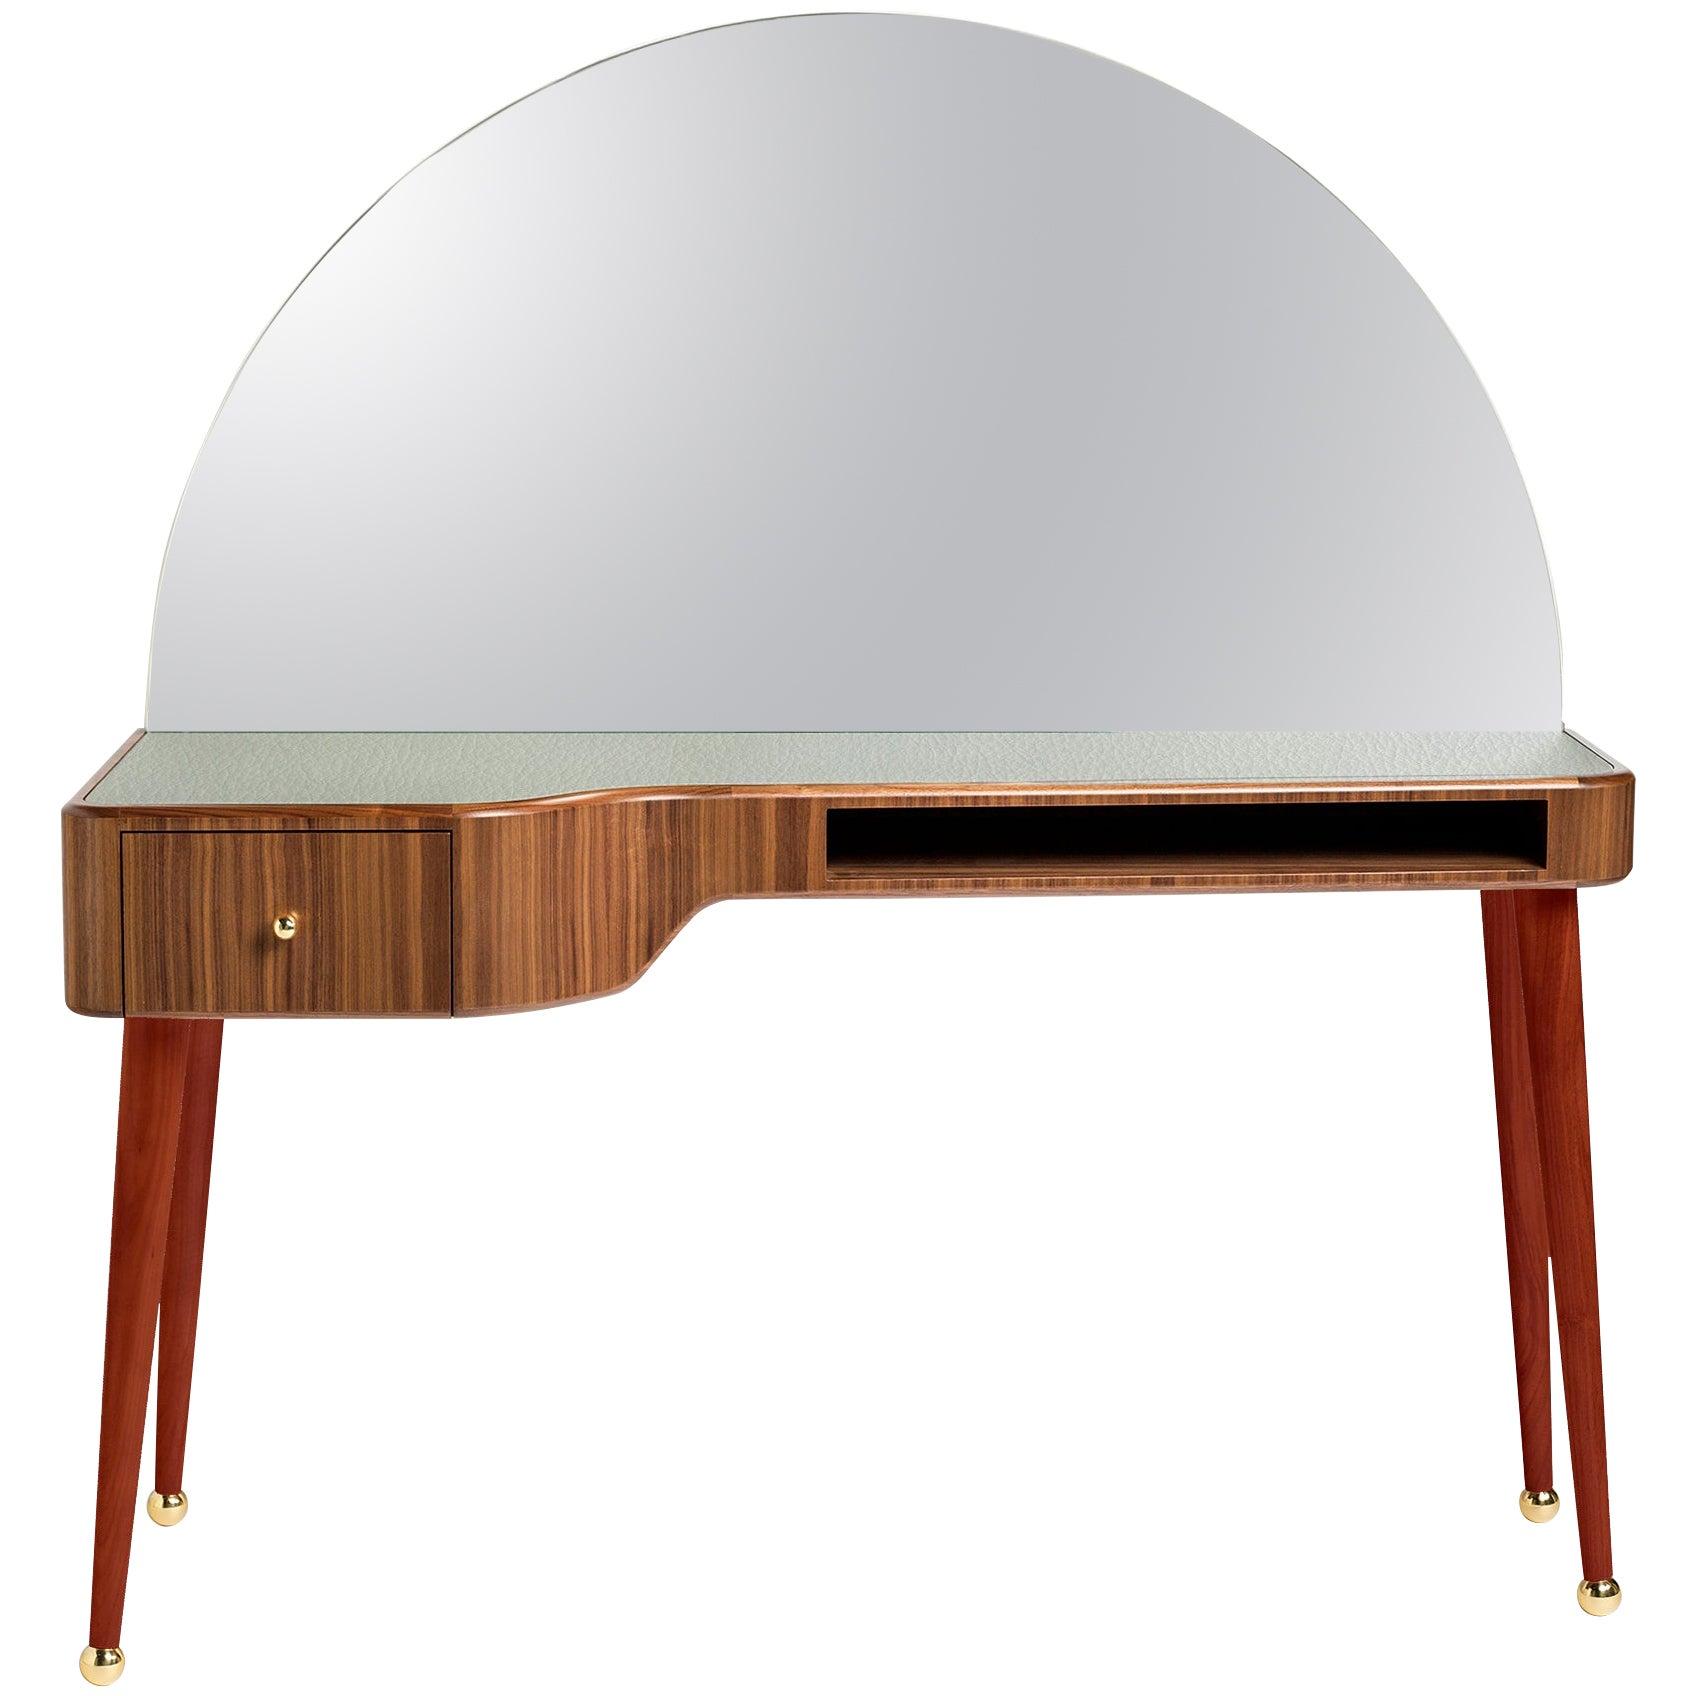 21st Century American Walnut Veneer Vanity Desk with Mirror, Red & Gray